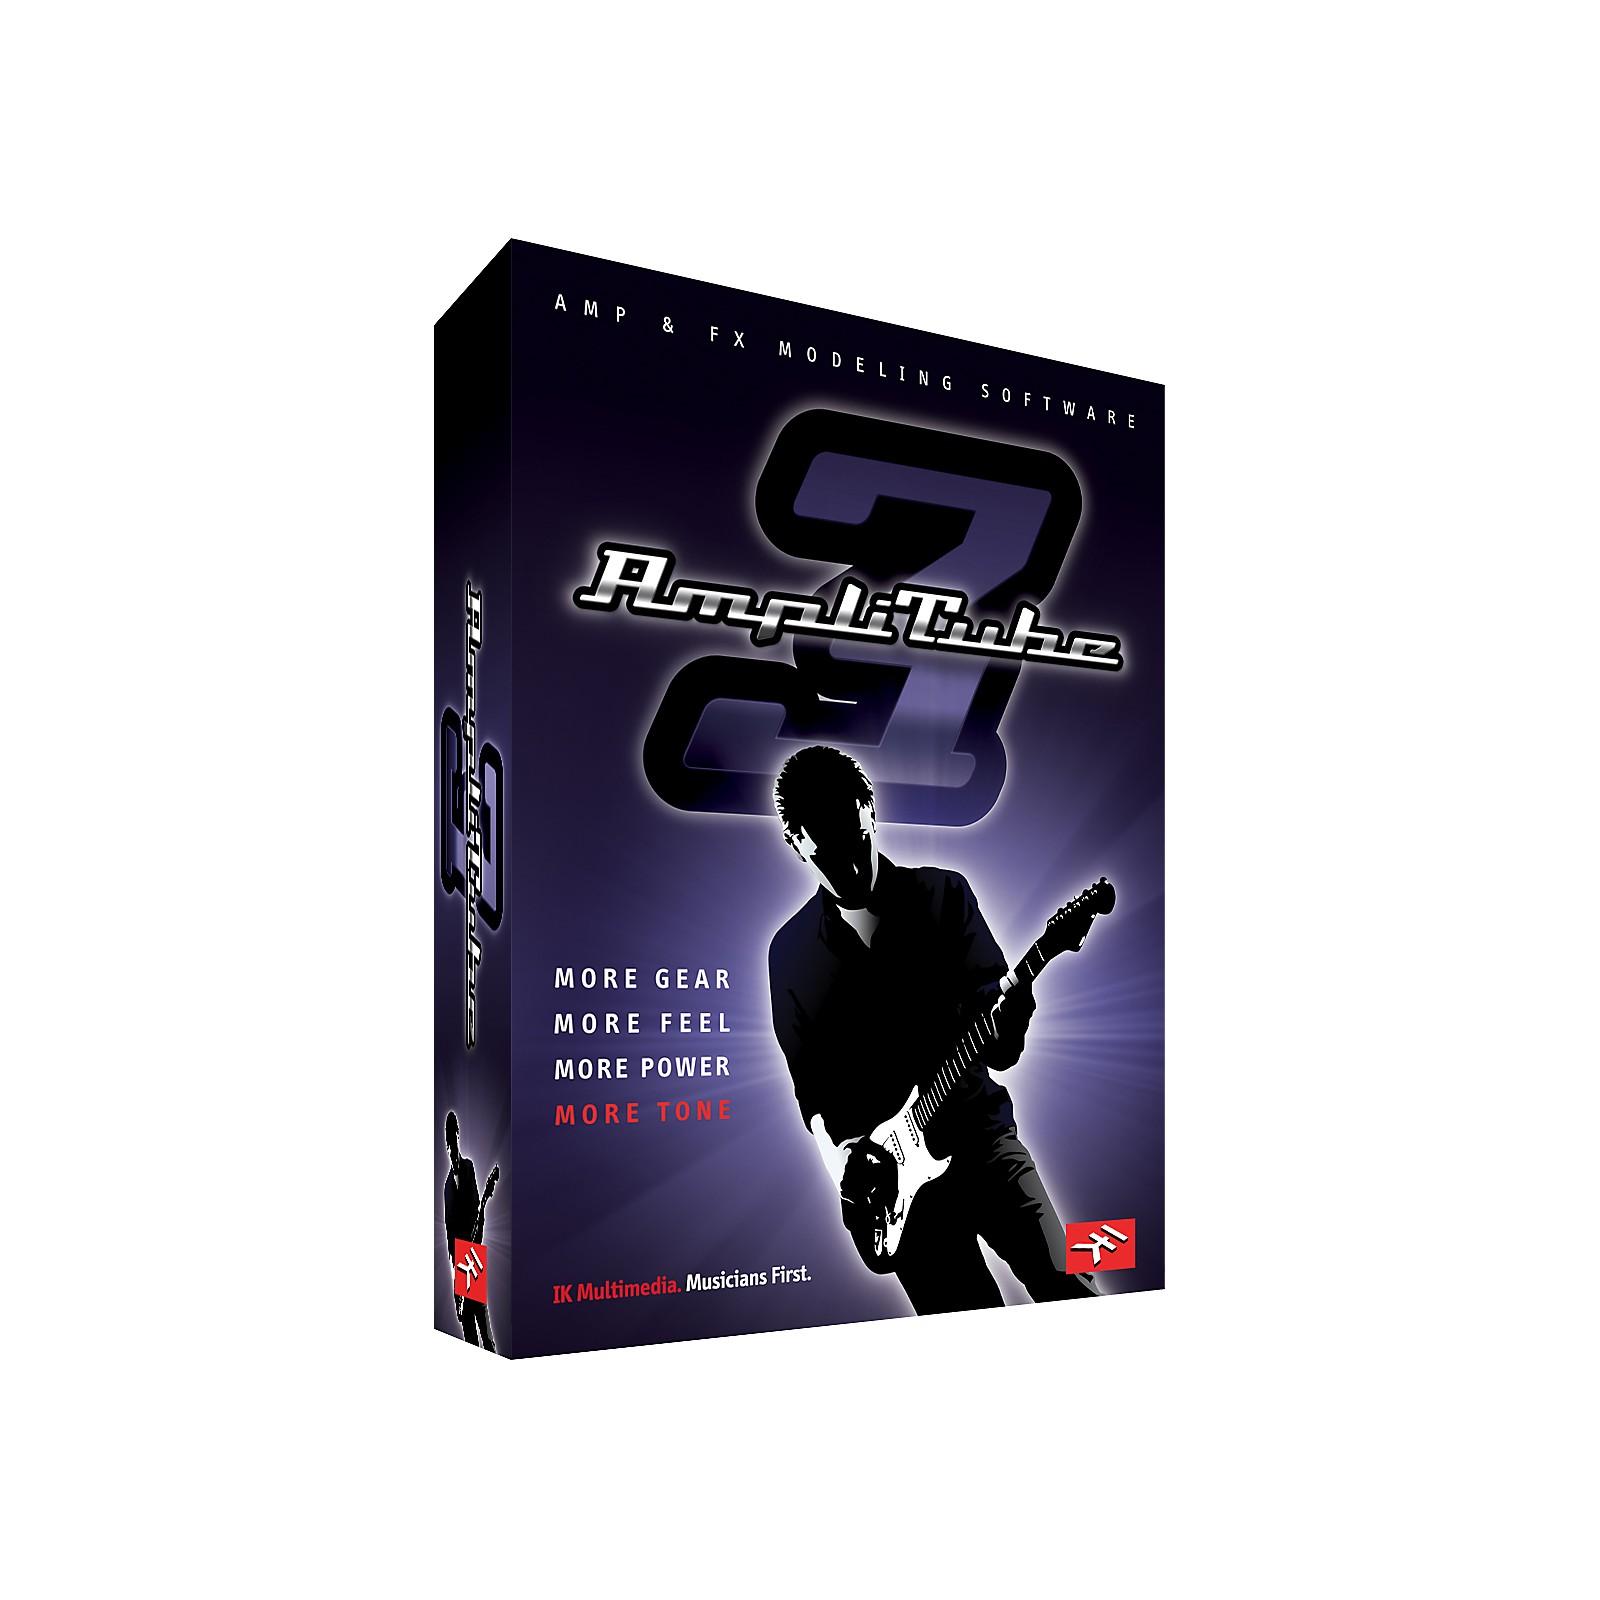 IK Multimedia AmpliTube 3 Amp & FX Tone Modeling Software